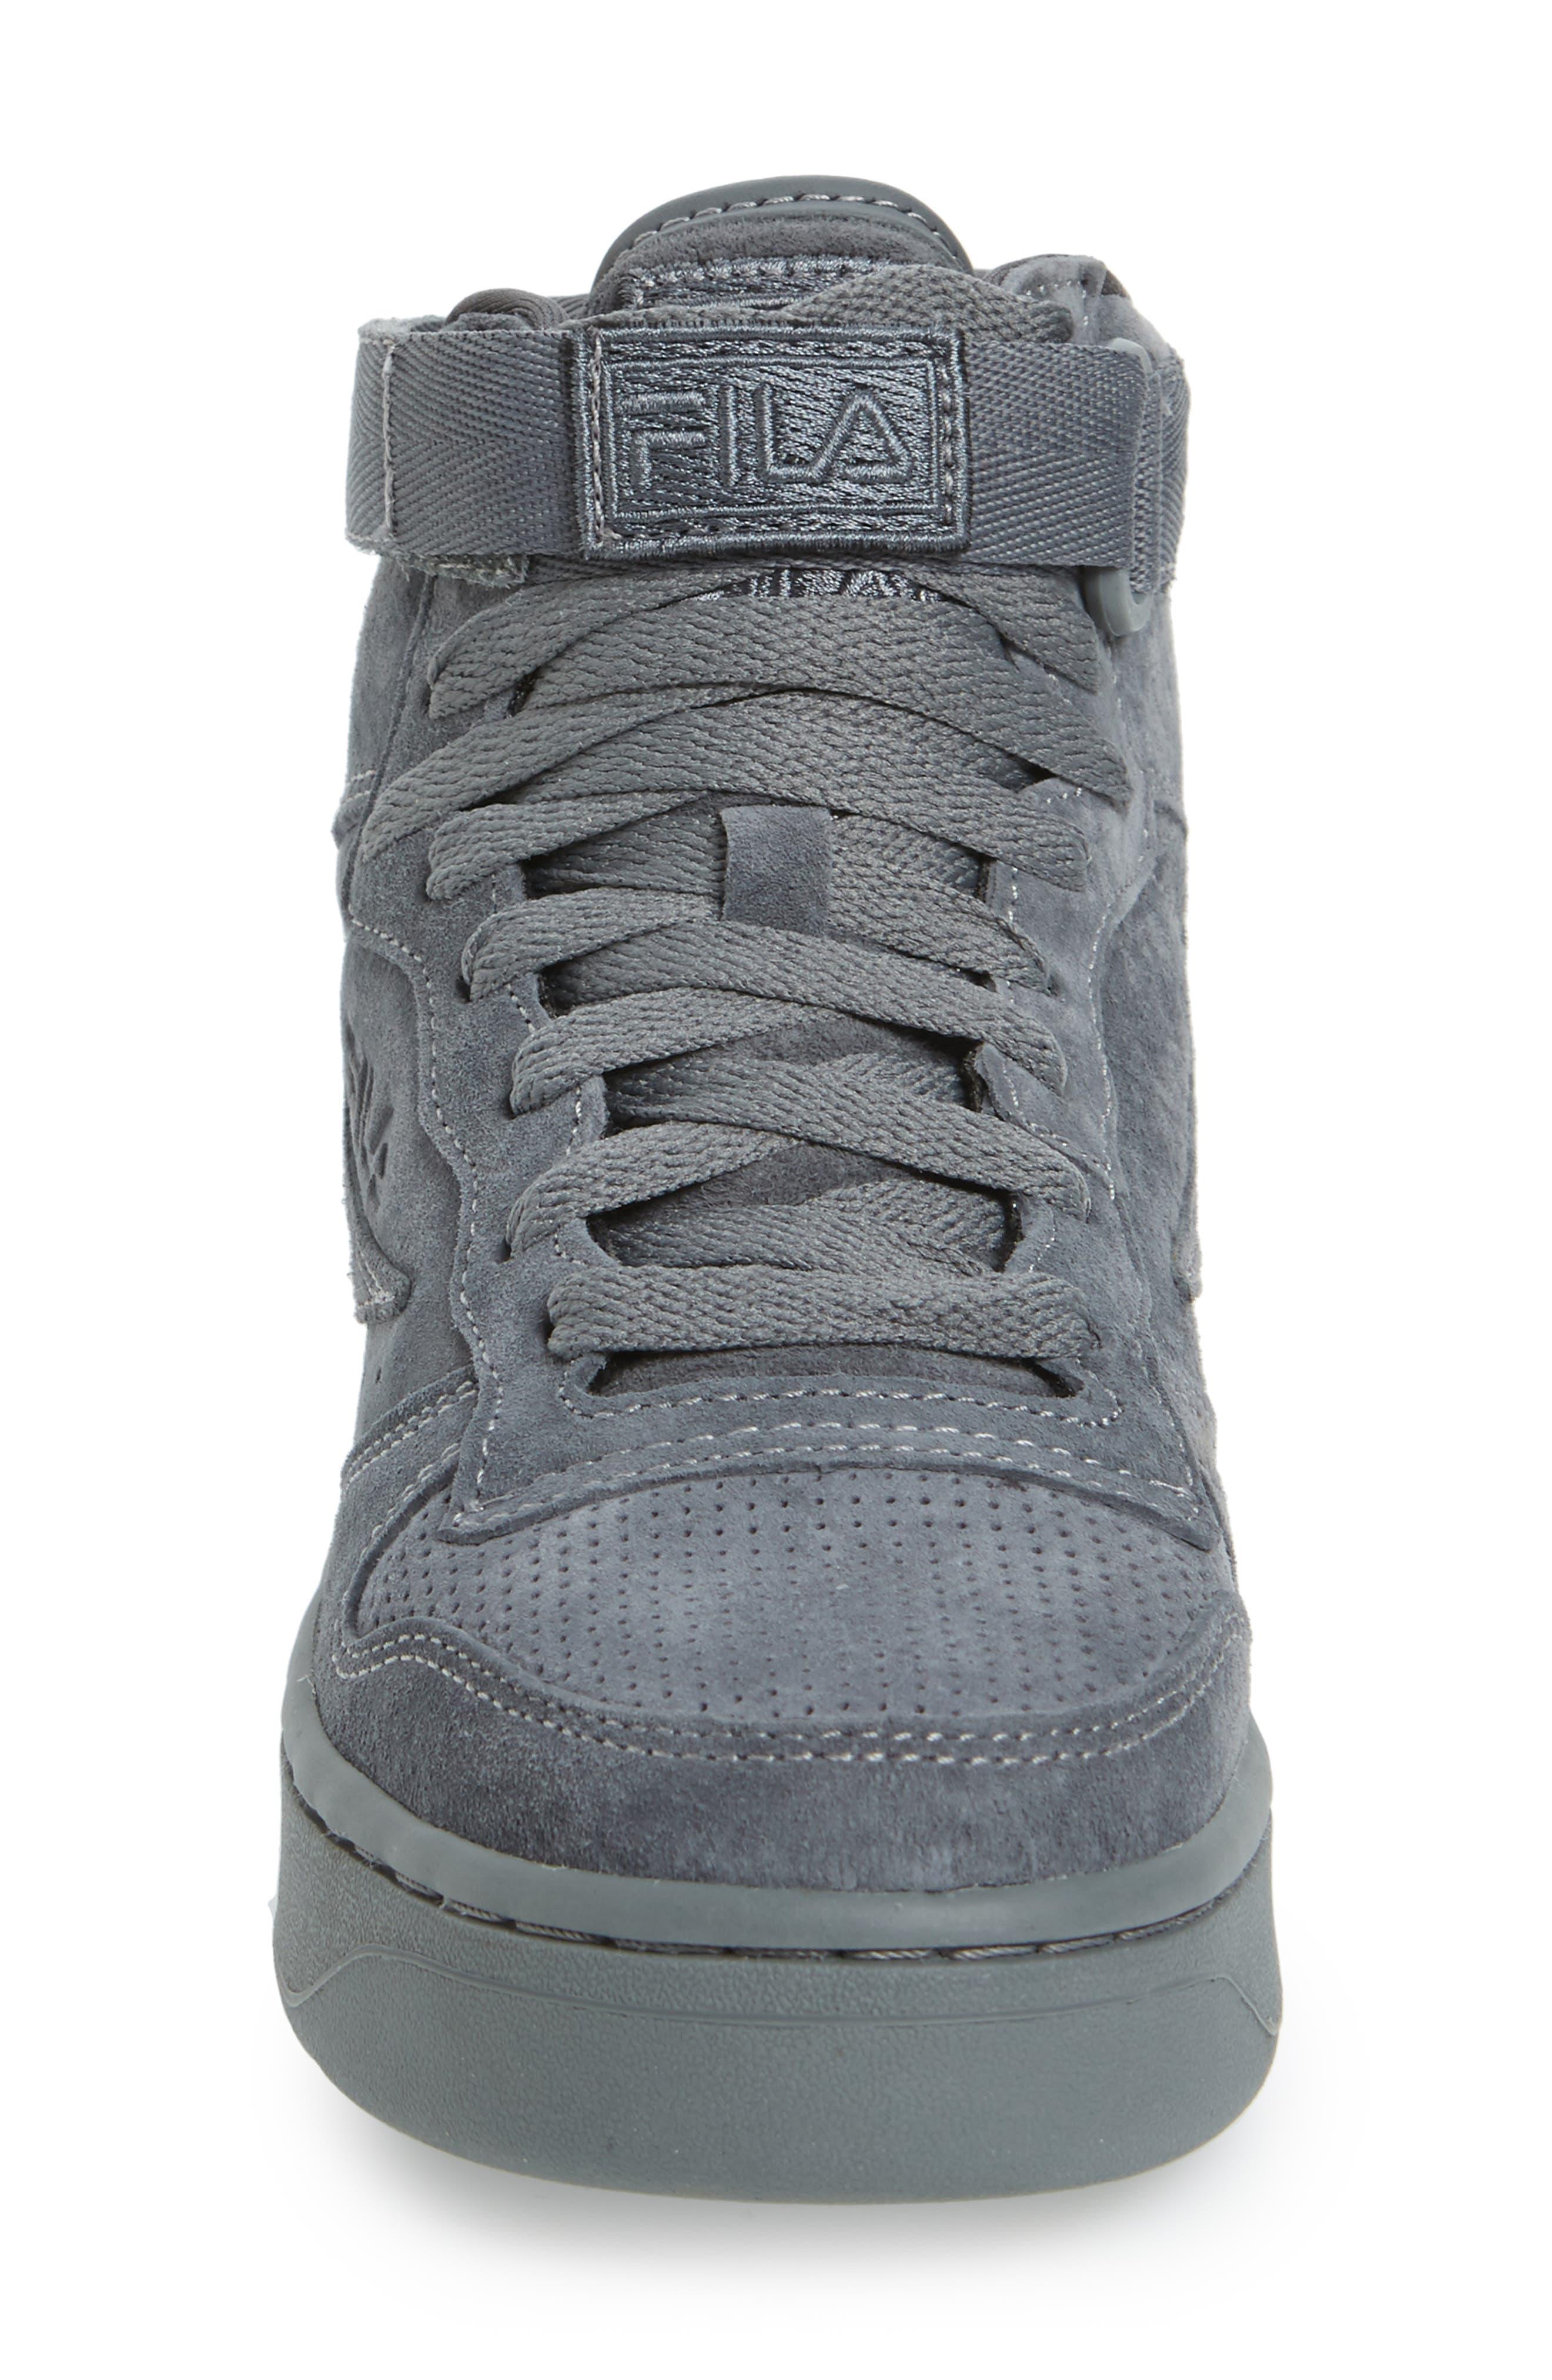 USA FX-100 High Top Sneaker,                             Alternate thumbnail 3, color,                             050